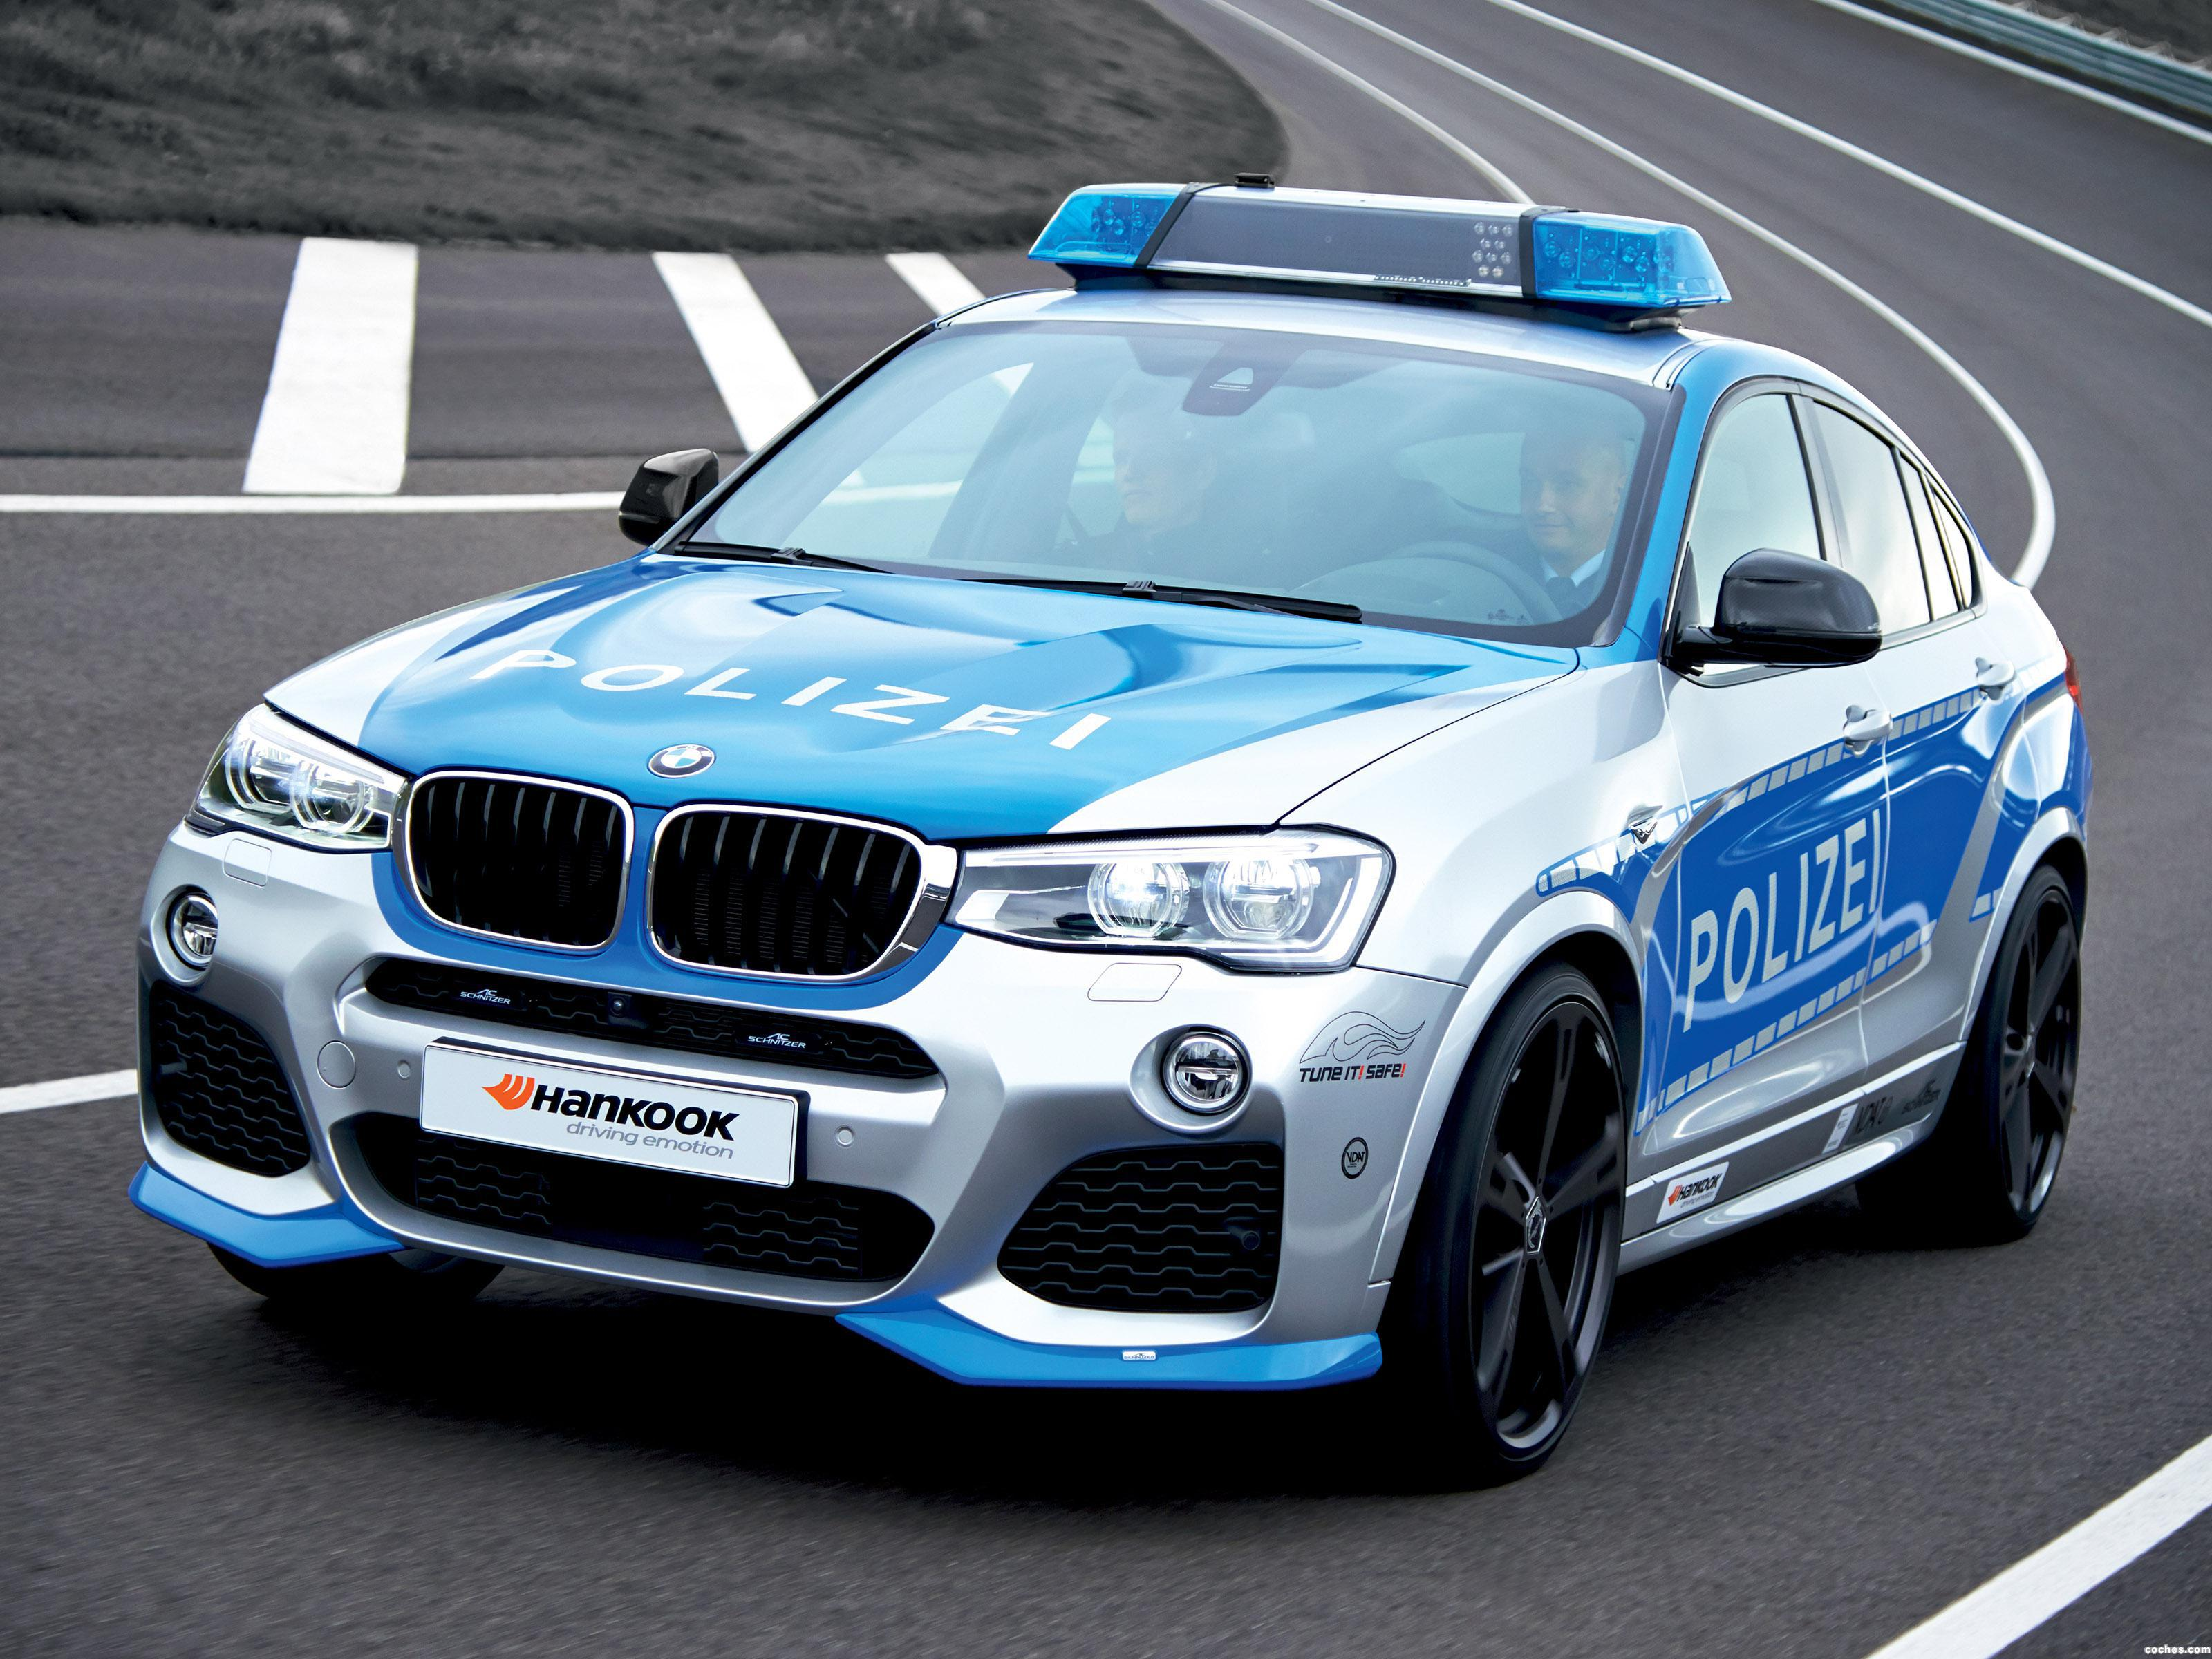 Foto 0 de AC-Schnitzer BMW X4 ACS Polizei Tune ItI Safe! Conc 2014